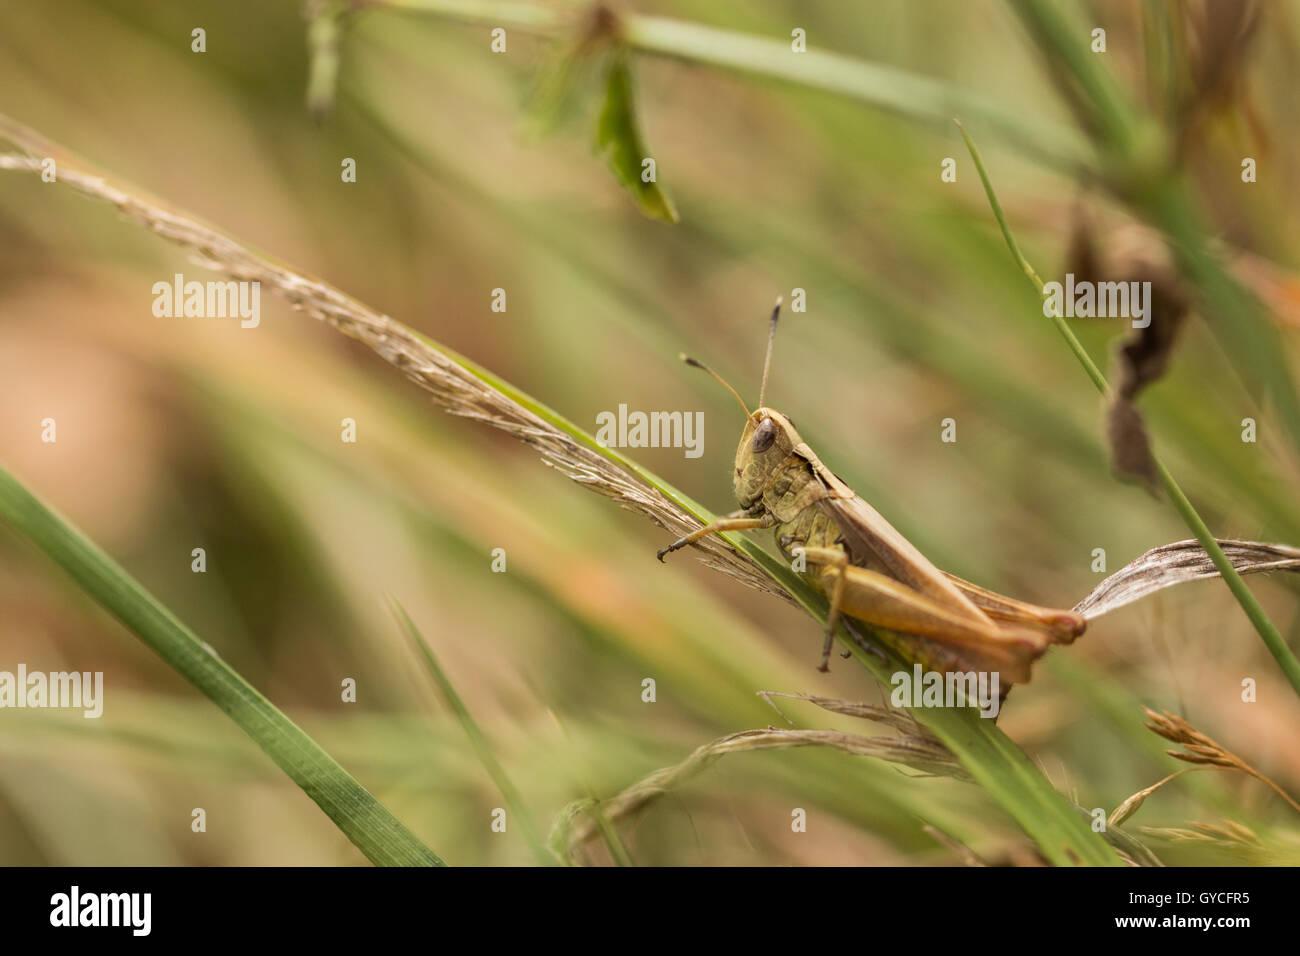 grasshopper on a grass blade - Stock Image